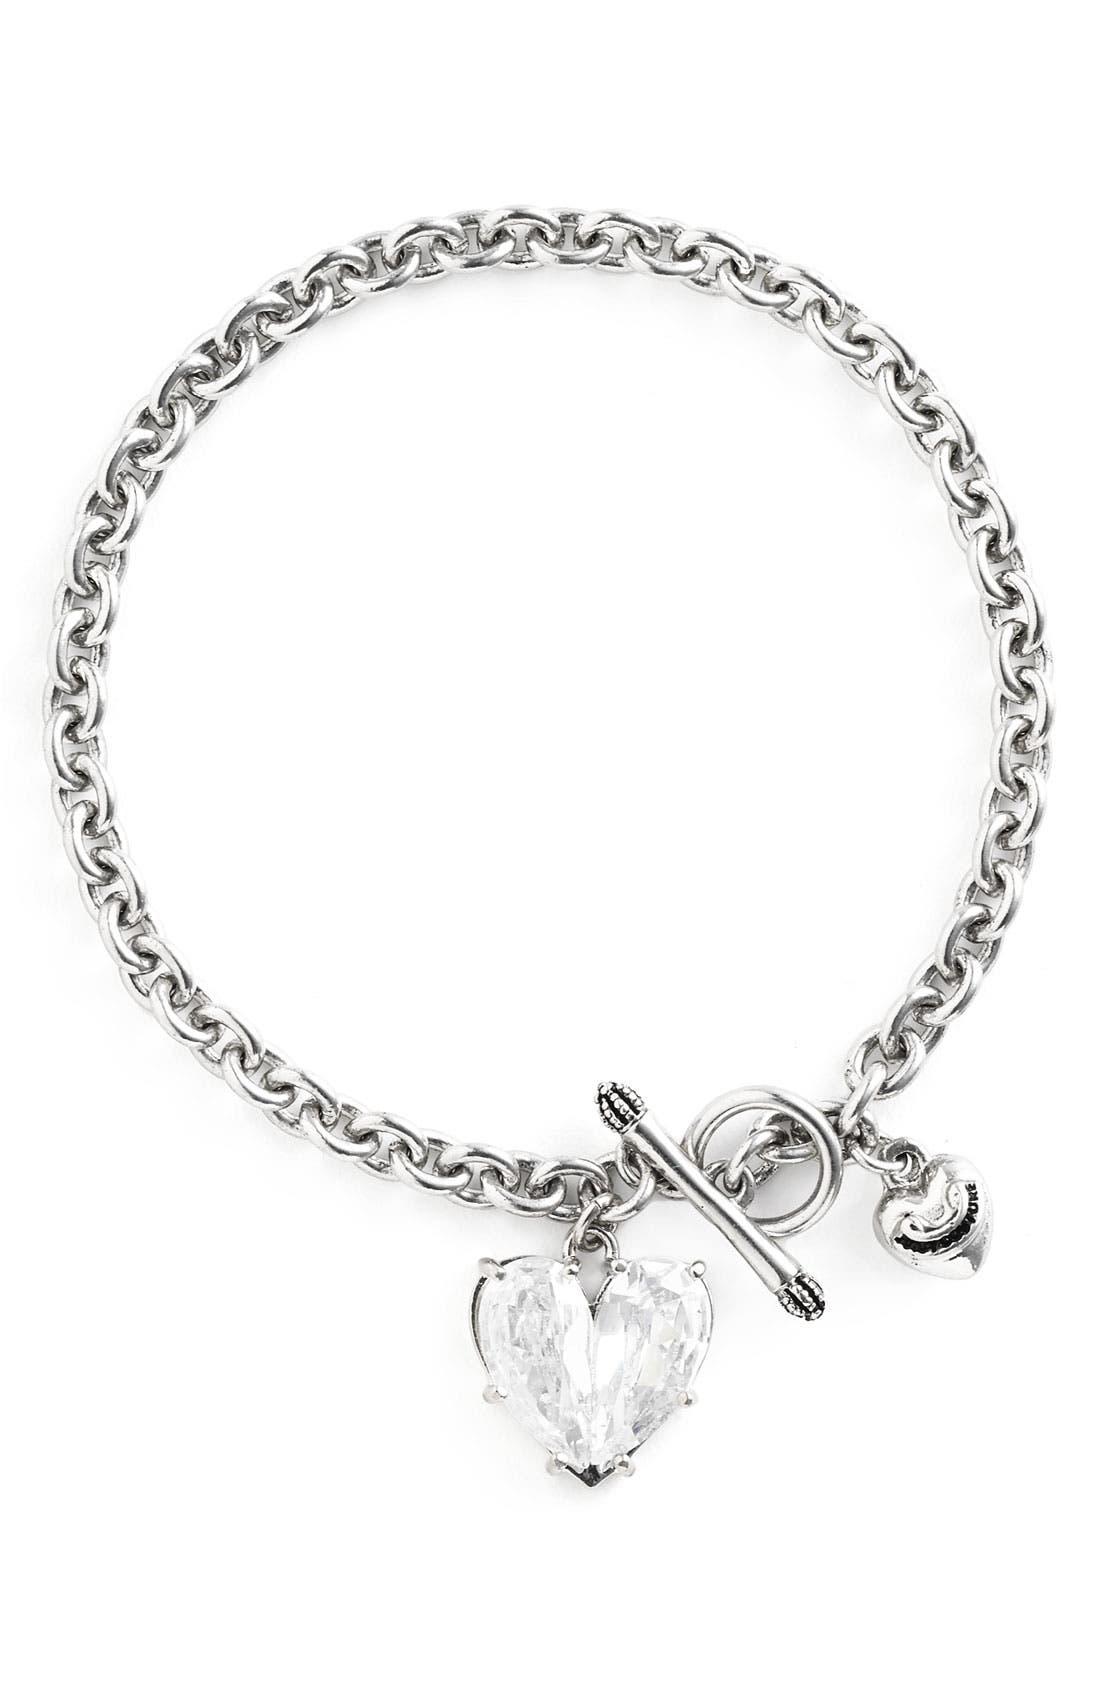 Alternate Image 1 Selected - Juicy Couture 'Juicy Icons CZ Wish' Bracelet